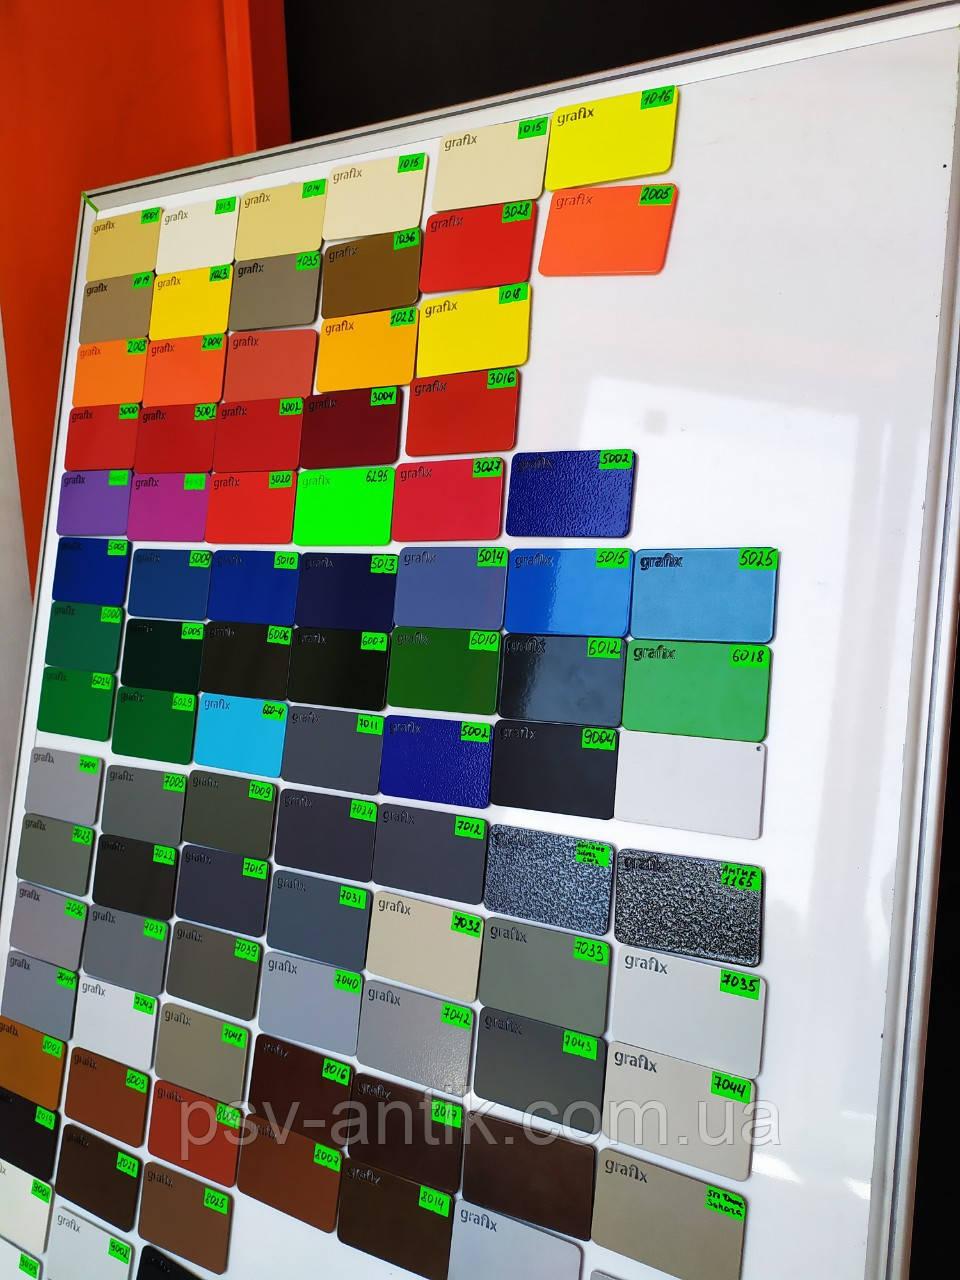 Порошковая краска глянцевая, полиэфирная, архитектурная, 9018